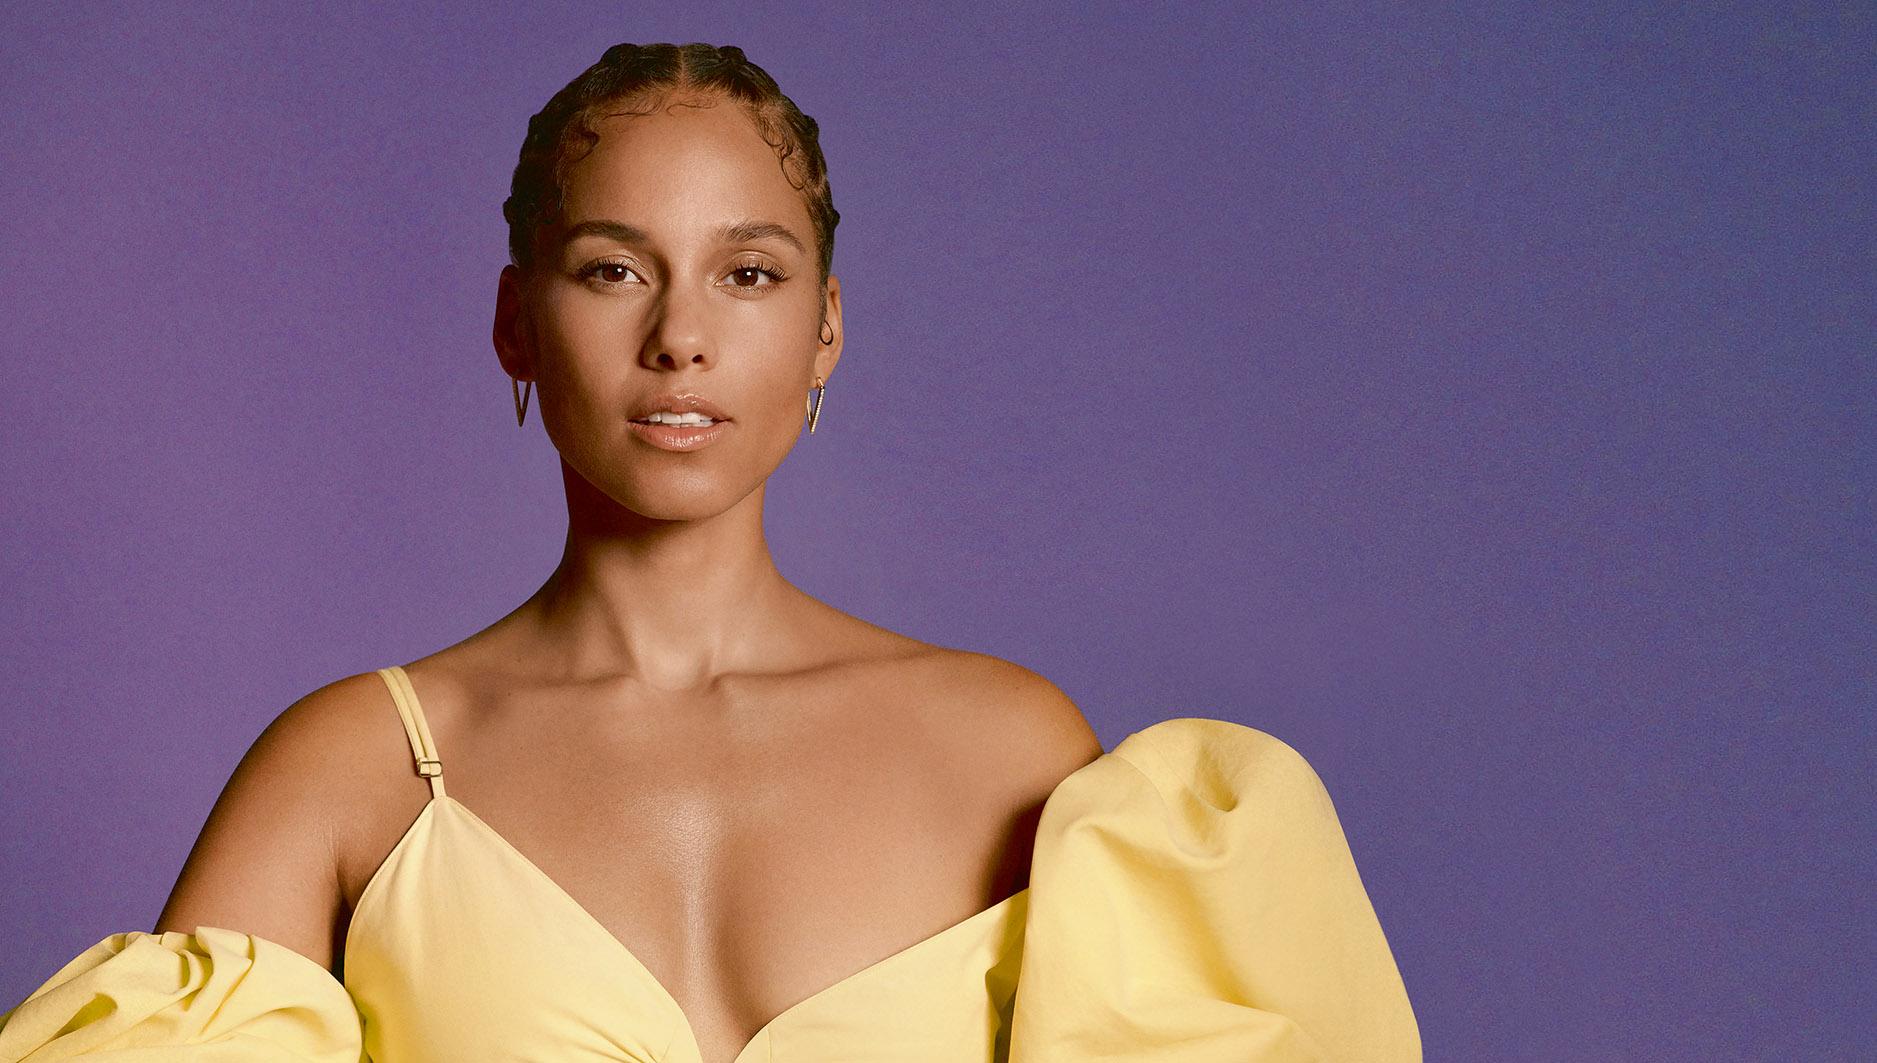 Alicia Keys - Cisza po burzy